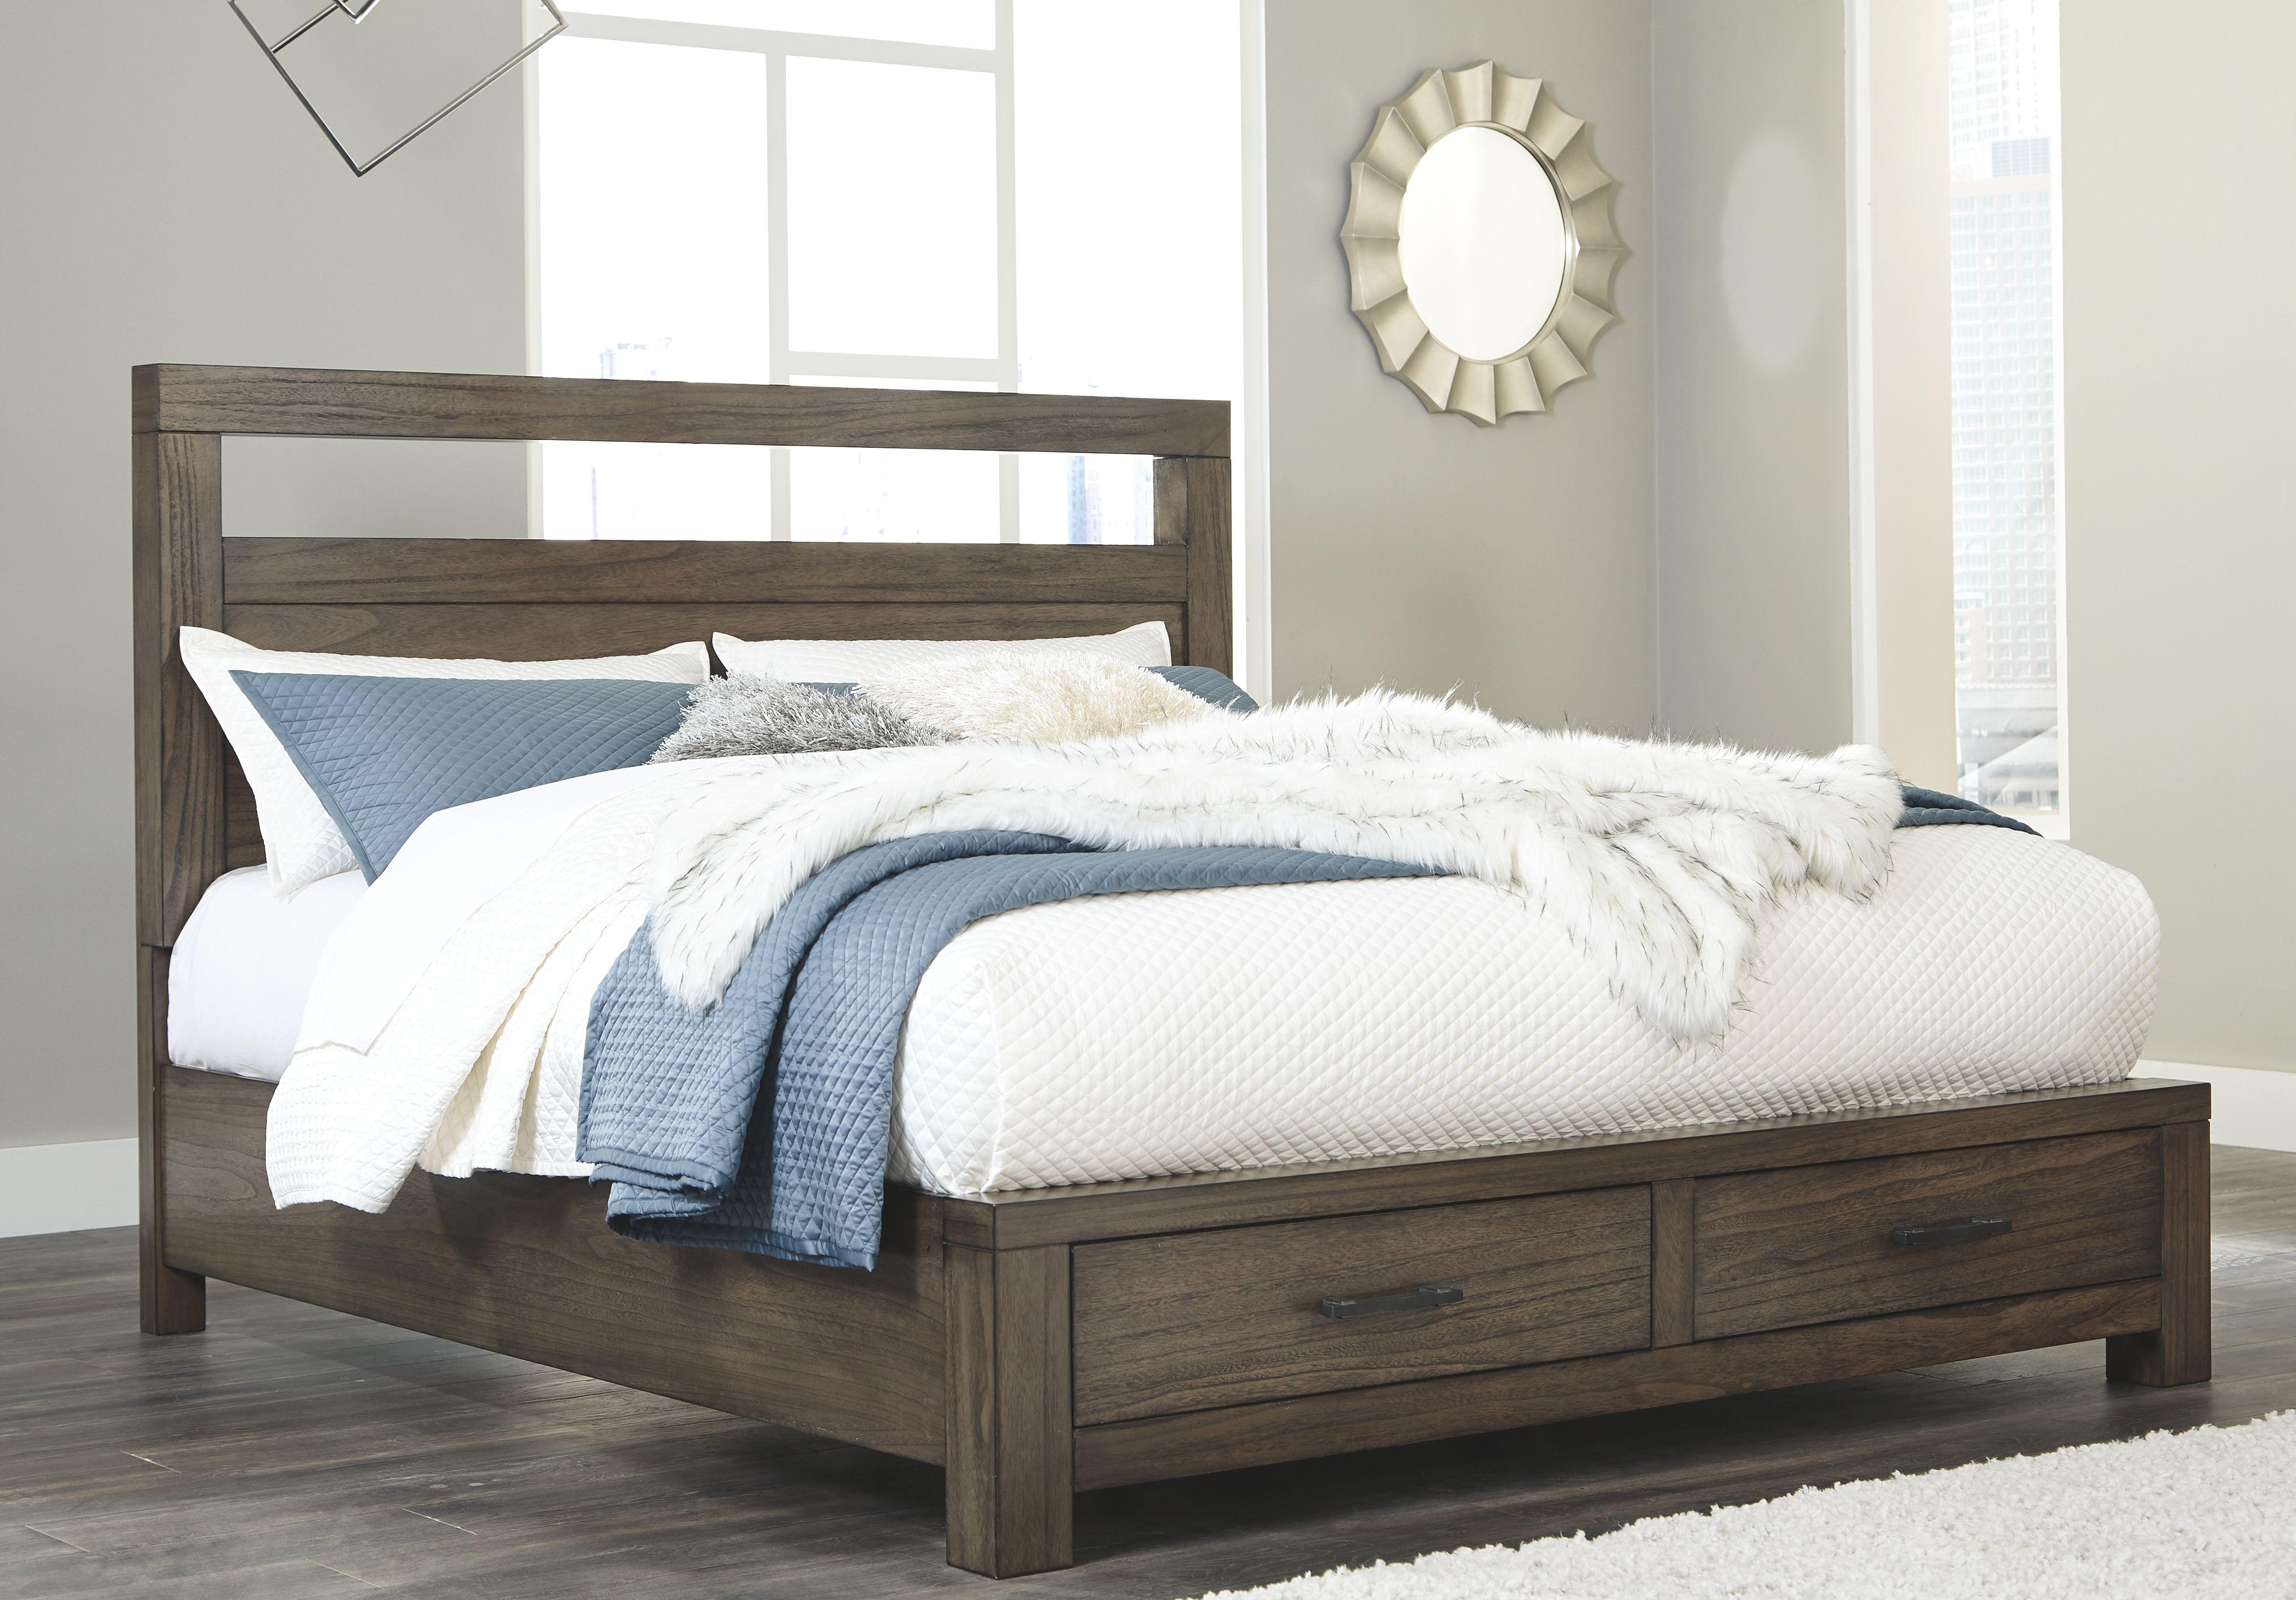 Deylin Queen Panel Bed with Storage, Grayish Brown Bed